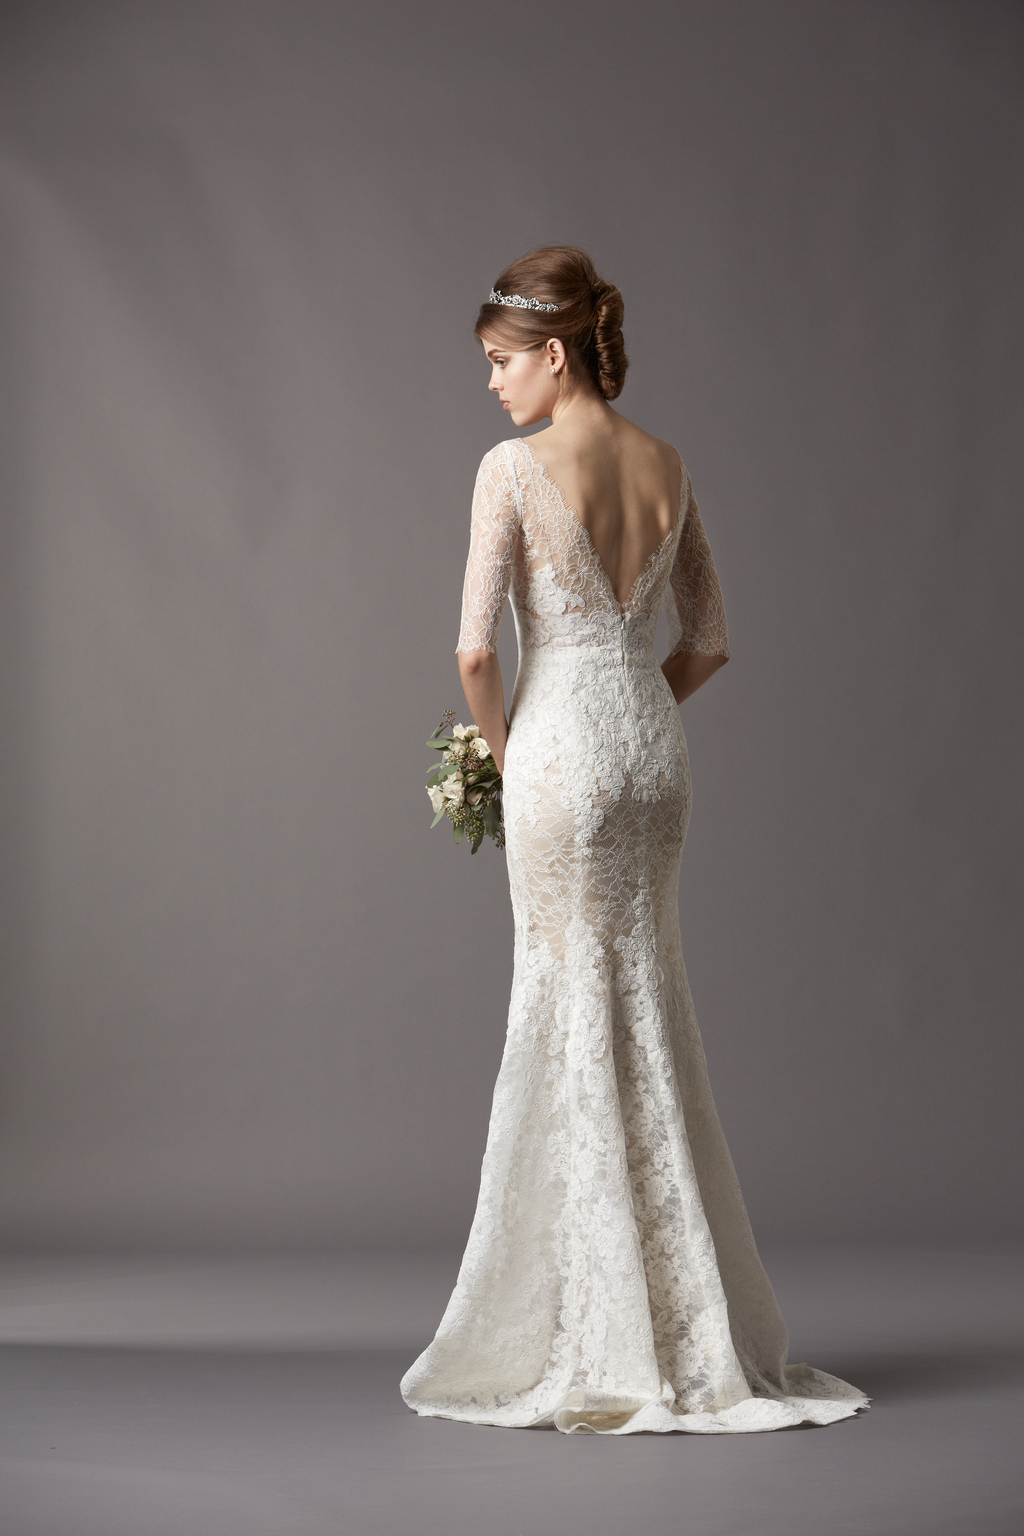 Watters-bridal-gowns-fall-2013-wedding-dress-4096b-a.full